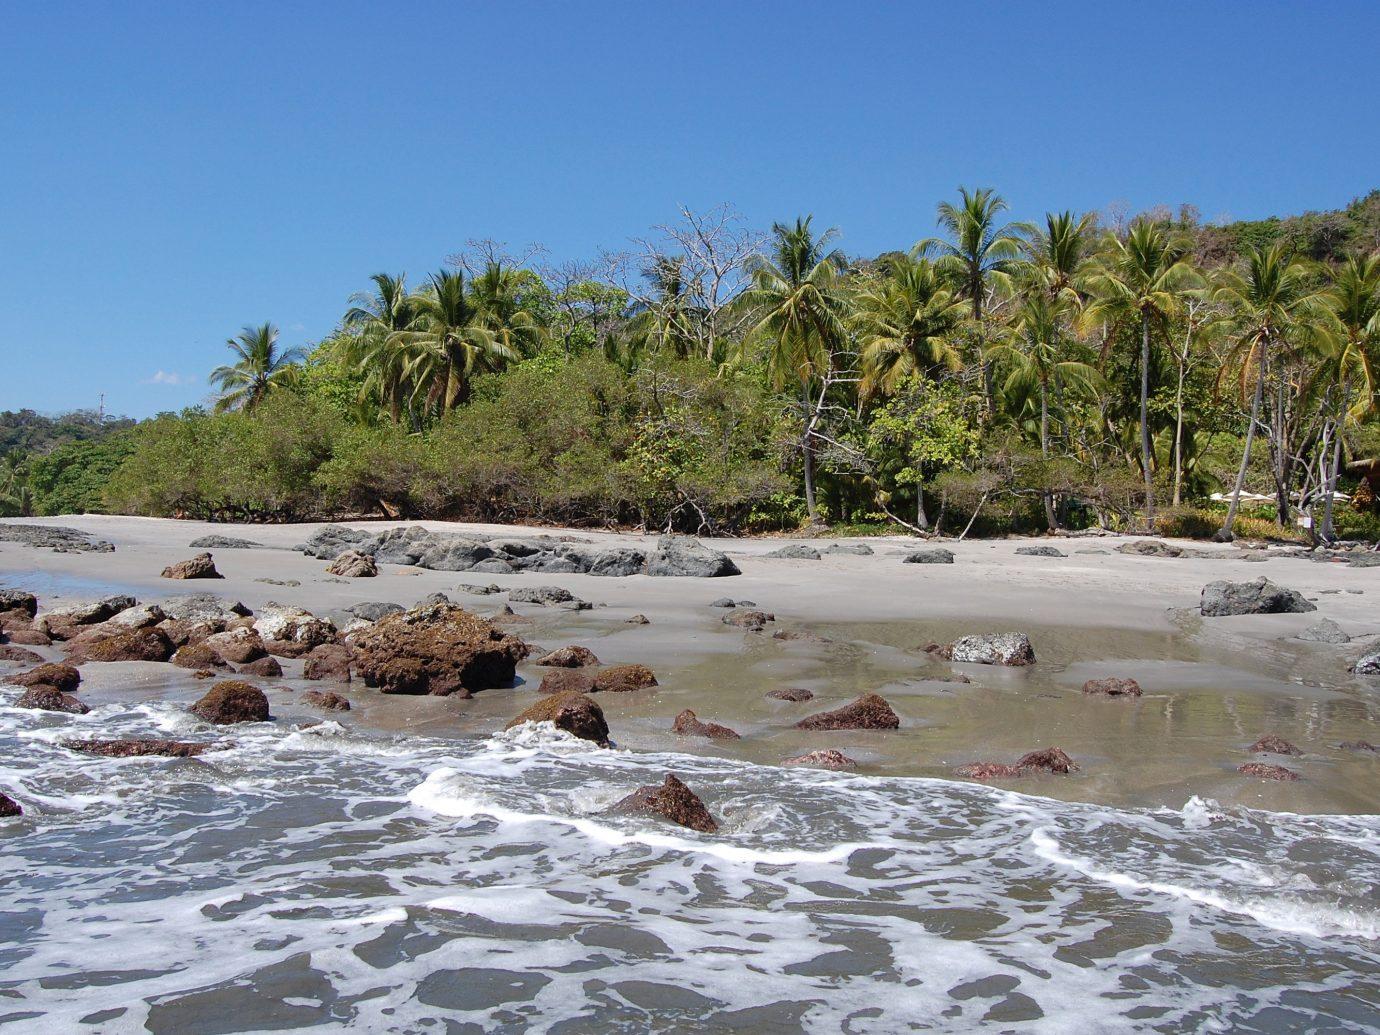 Beach at Playa Montezuma in Costa Rica